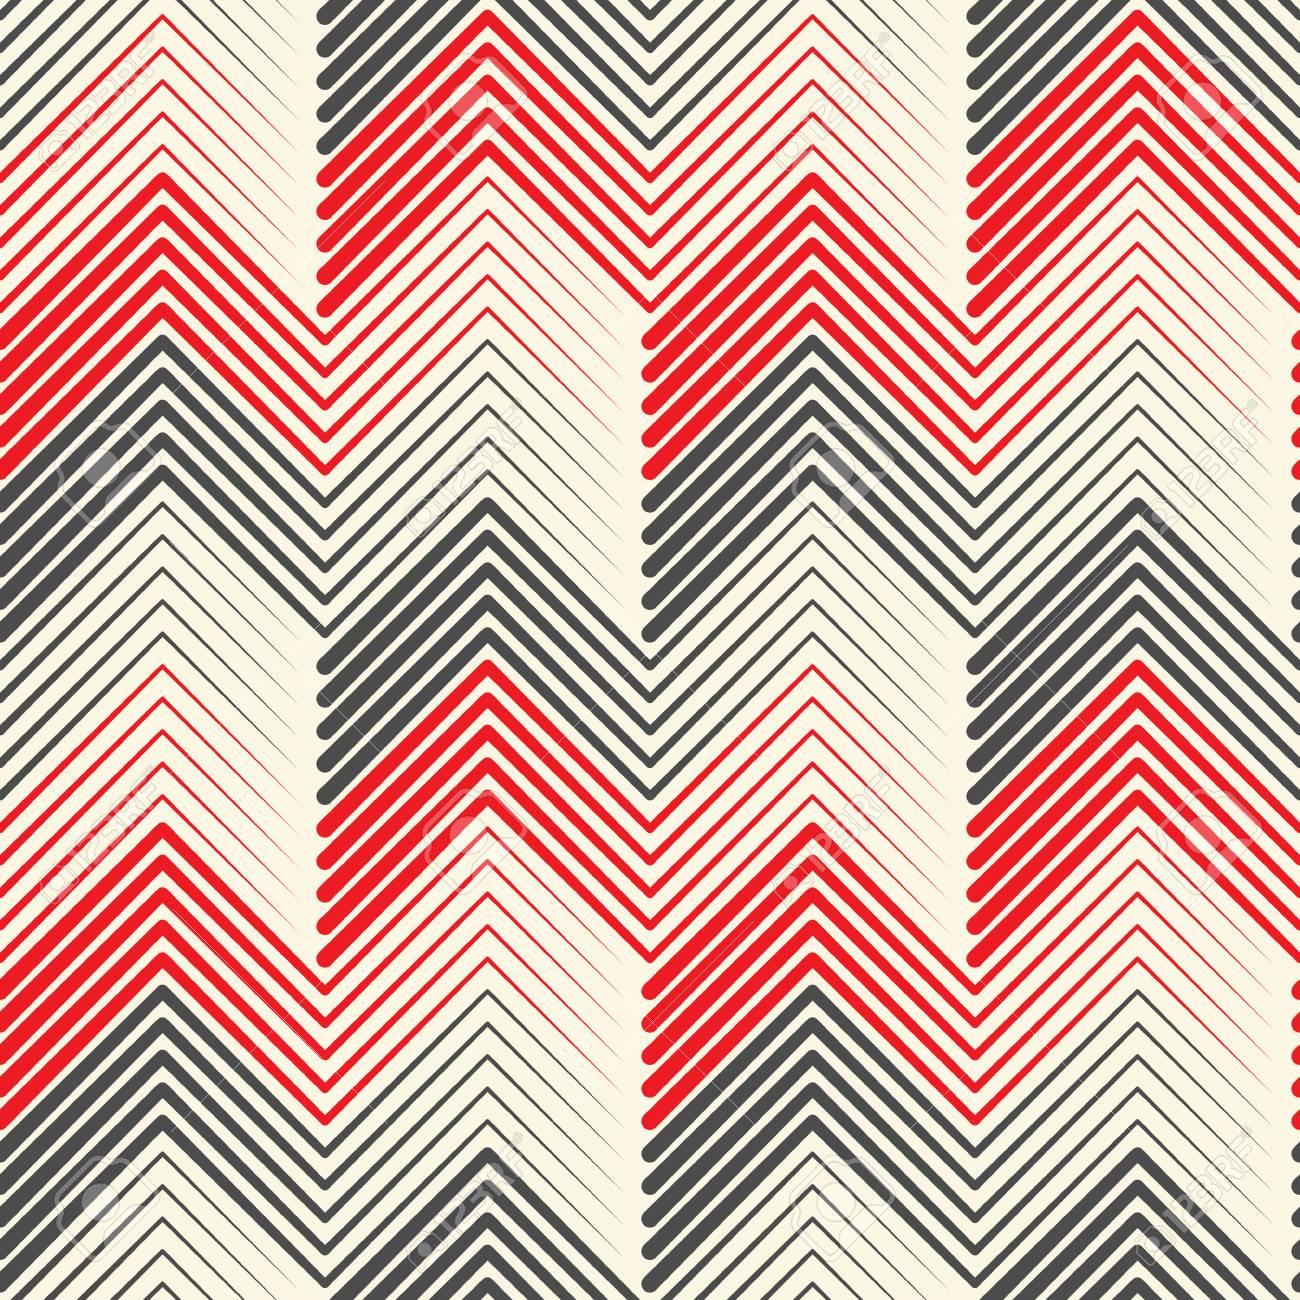 8x12 FT Yellow Chevron Vinyl Photography Backdrop,Old Fashioned Sharp Zigzag Stripes Geometric Sunny Summer Motif Background for Photo Backdrop Baby Newborn Photo Studio Props